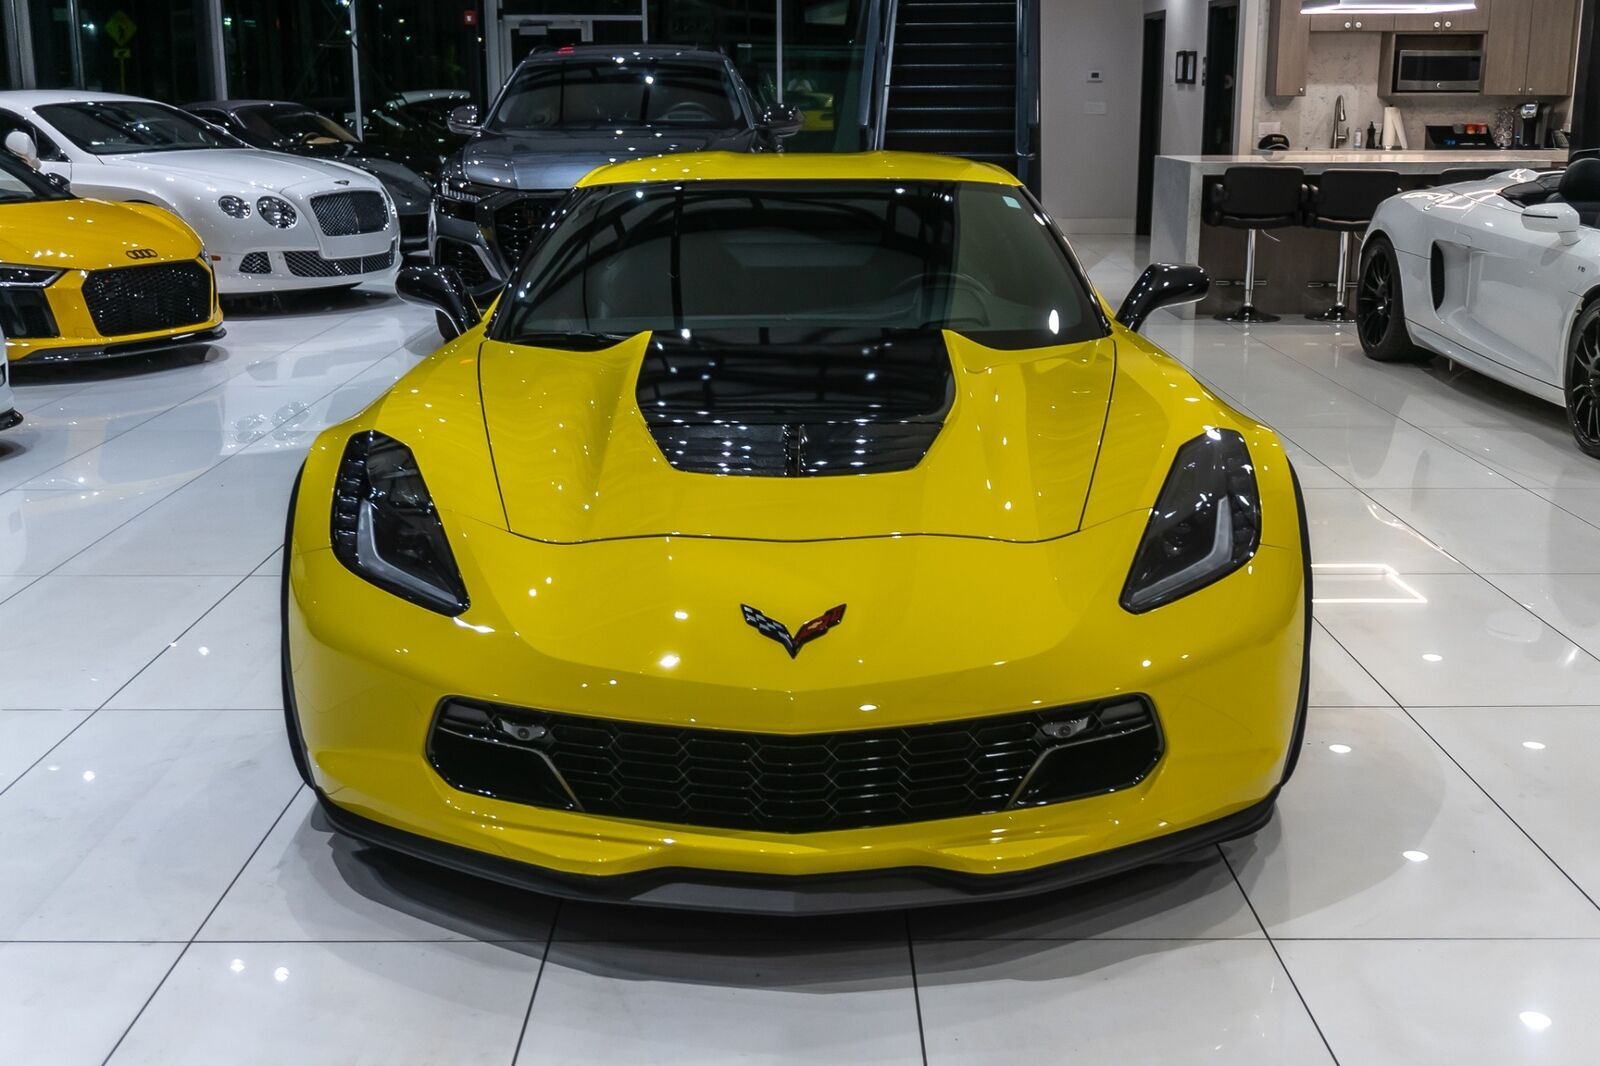 2016 Yellow Chevrolet Corvette Coupe 2LZ   C7 Corvette Photo 8